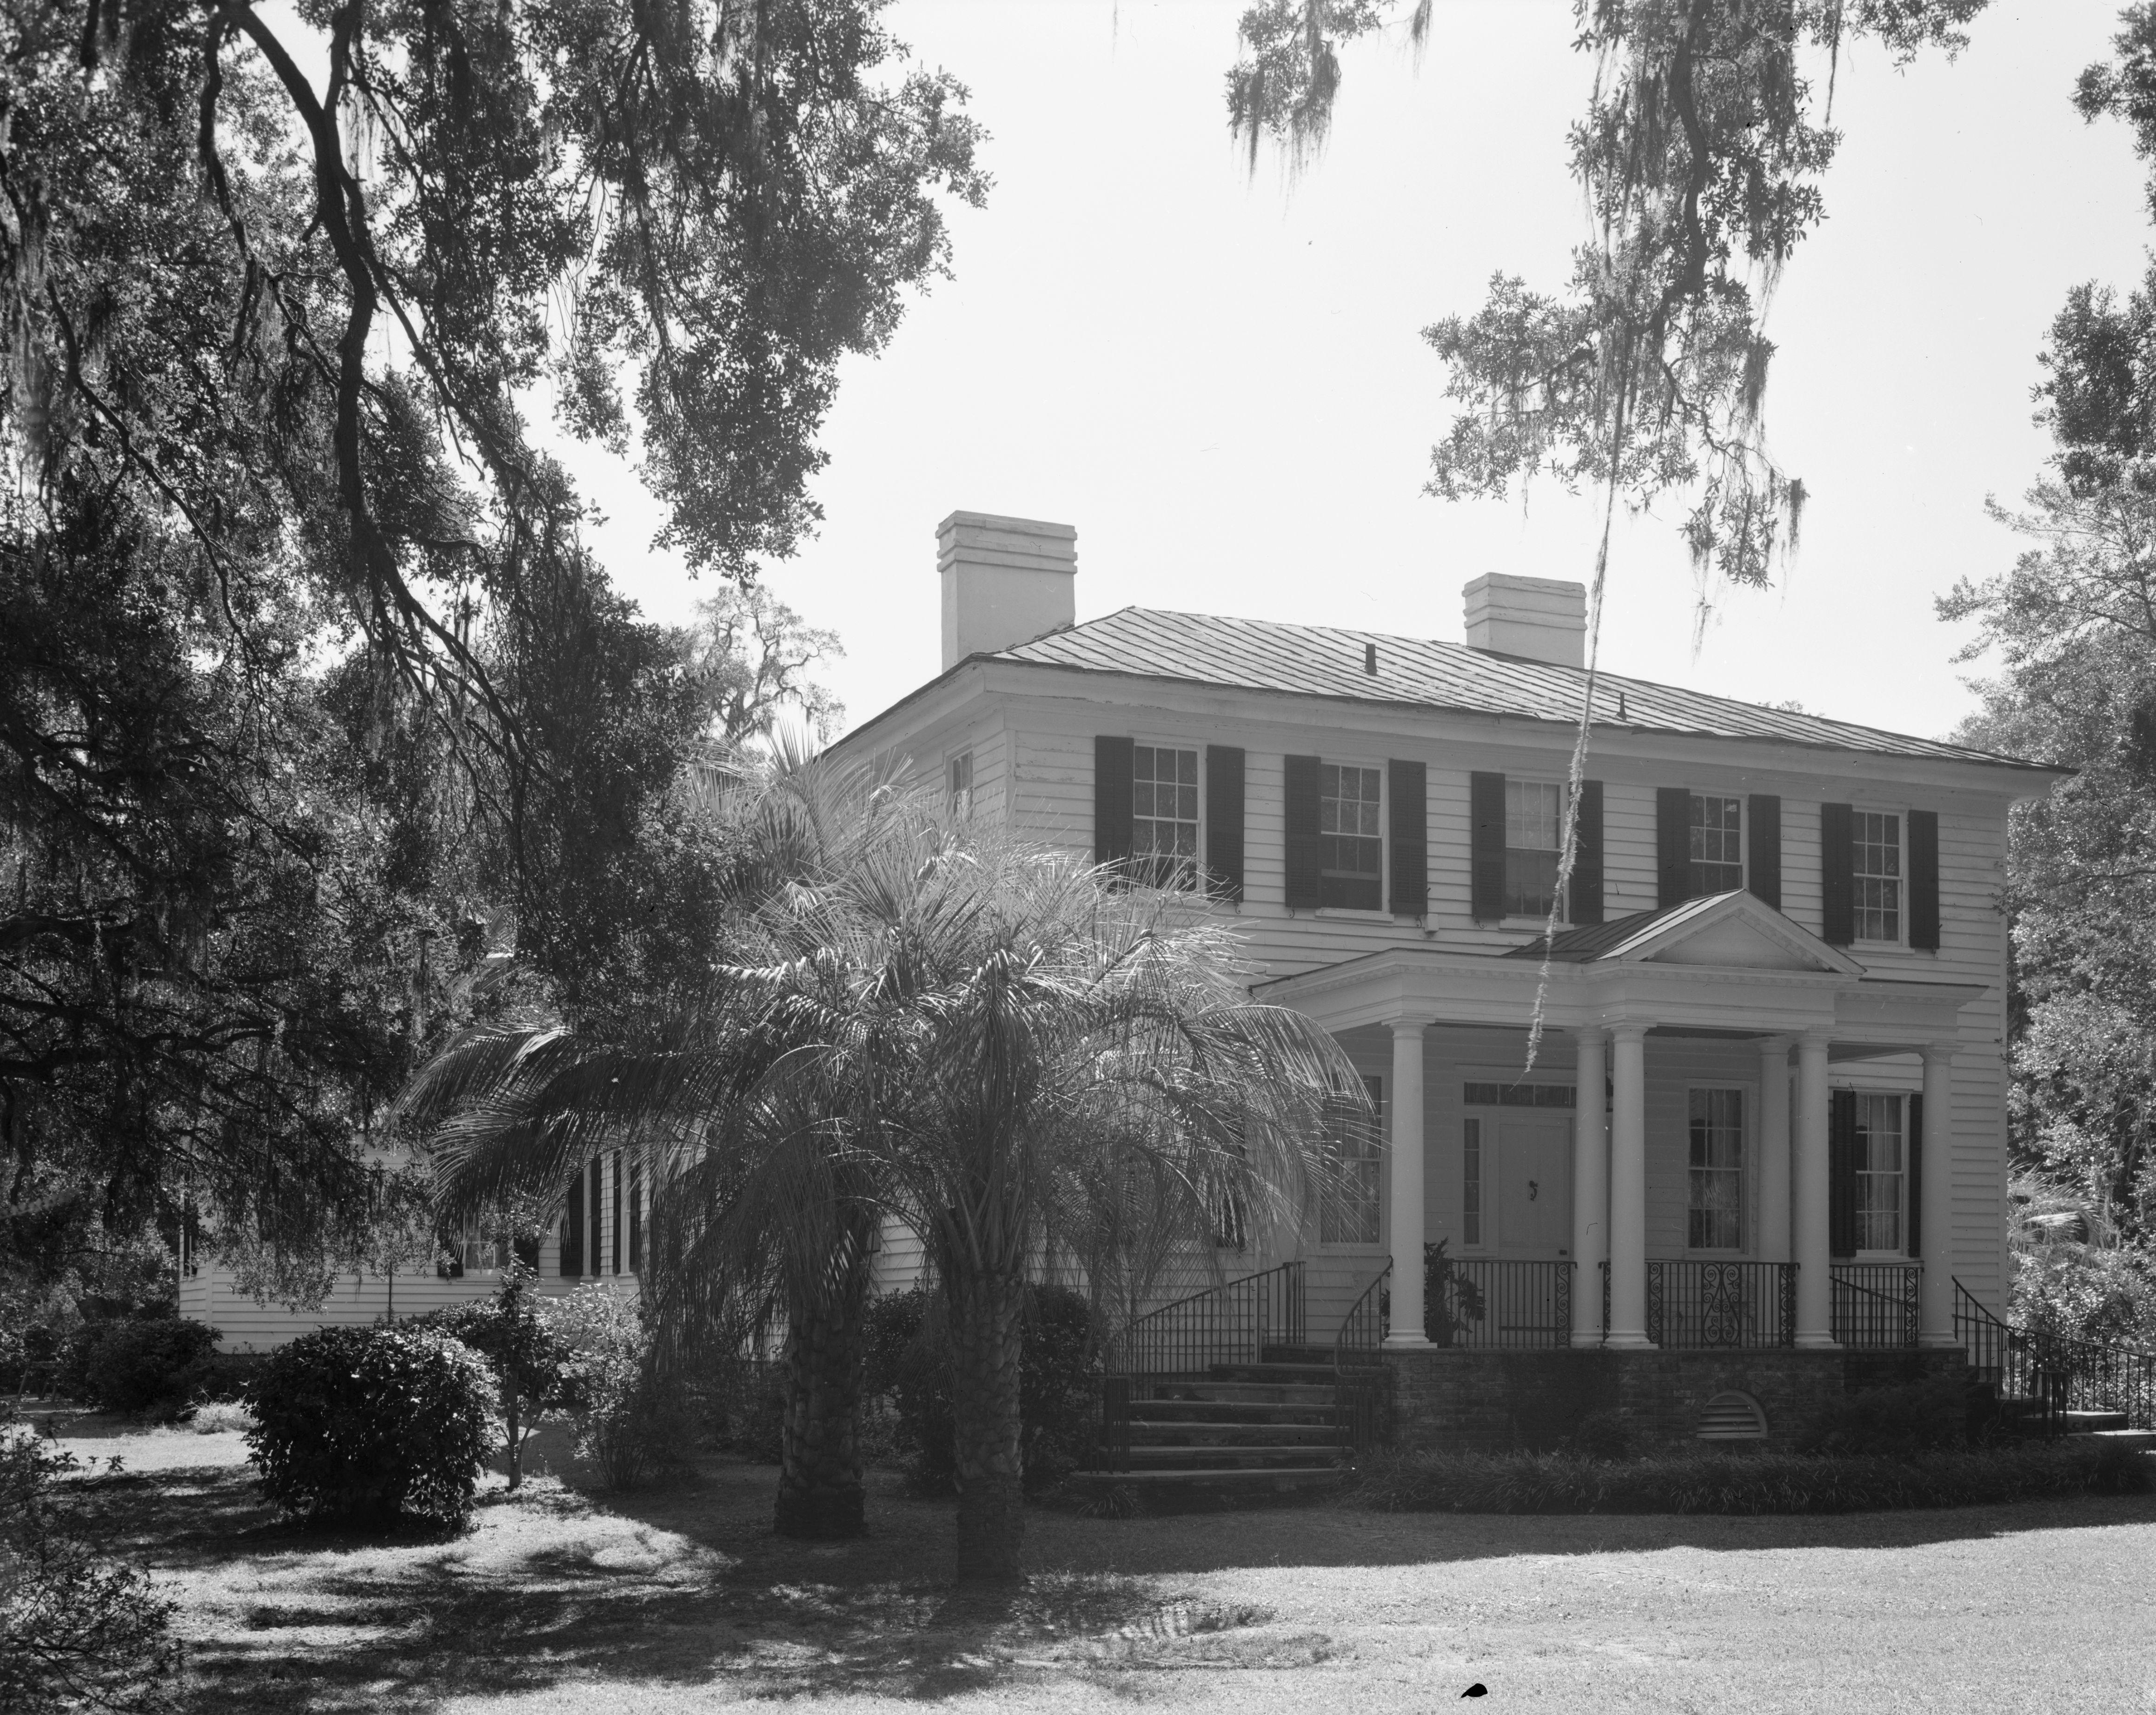 South Island Plantation Georgetown South Carolina